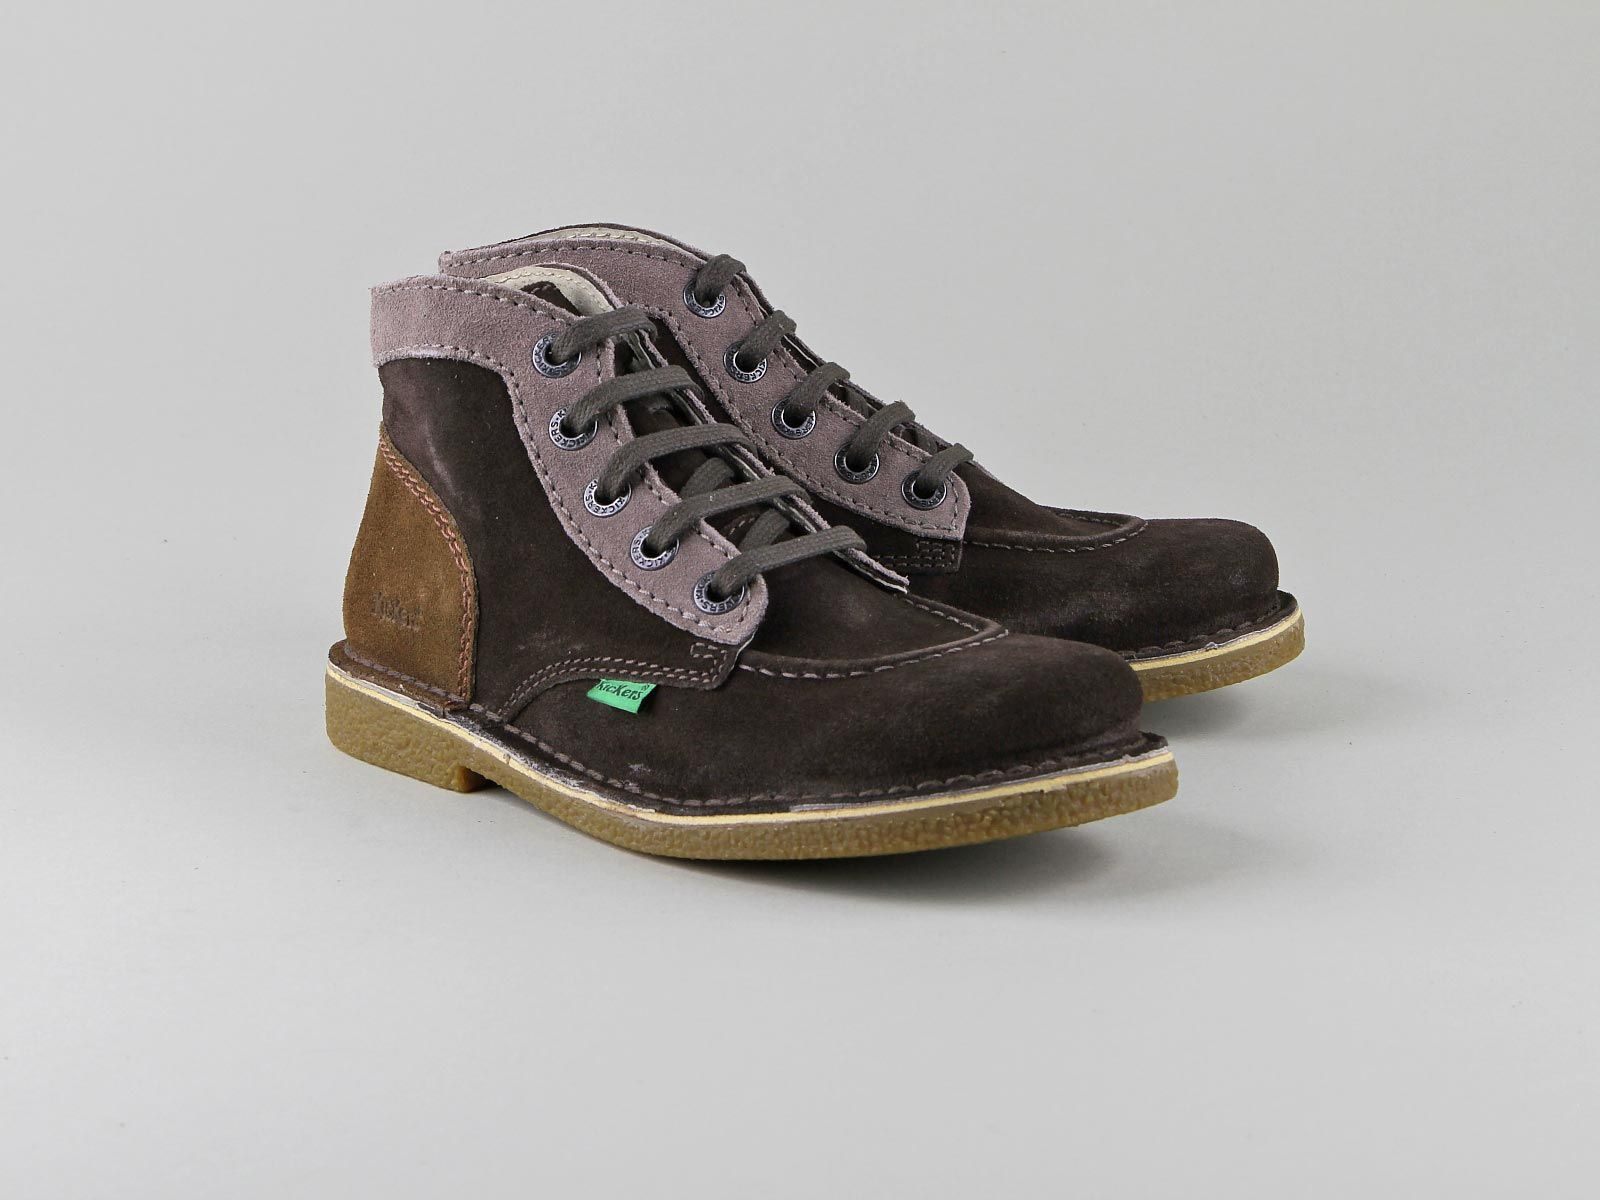 MontantsClothes Legendok Femme Kickers Chaussure Chaussures srtxodChQB